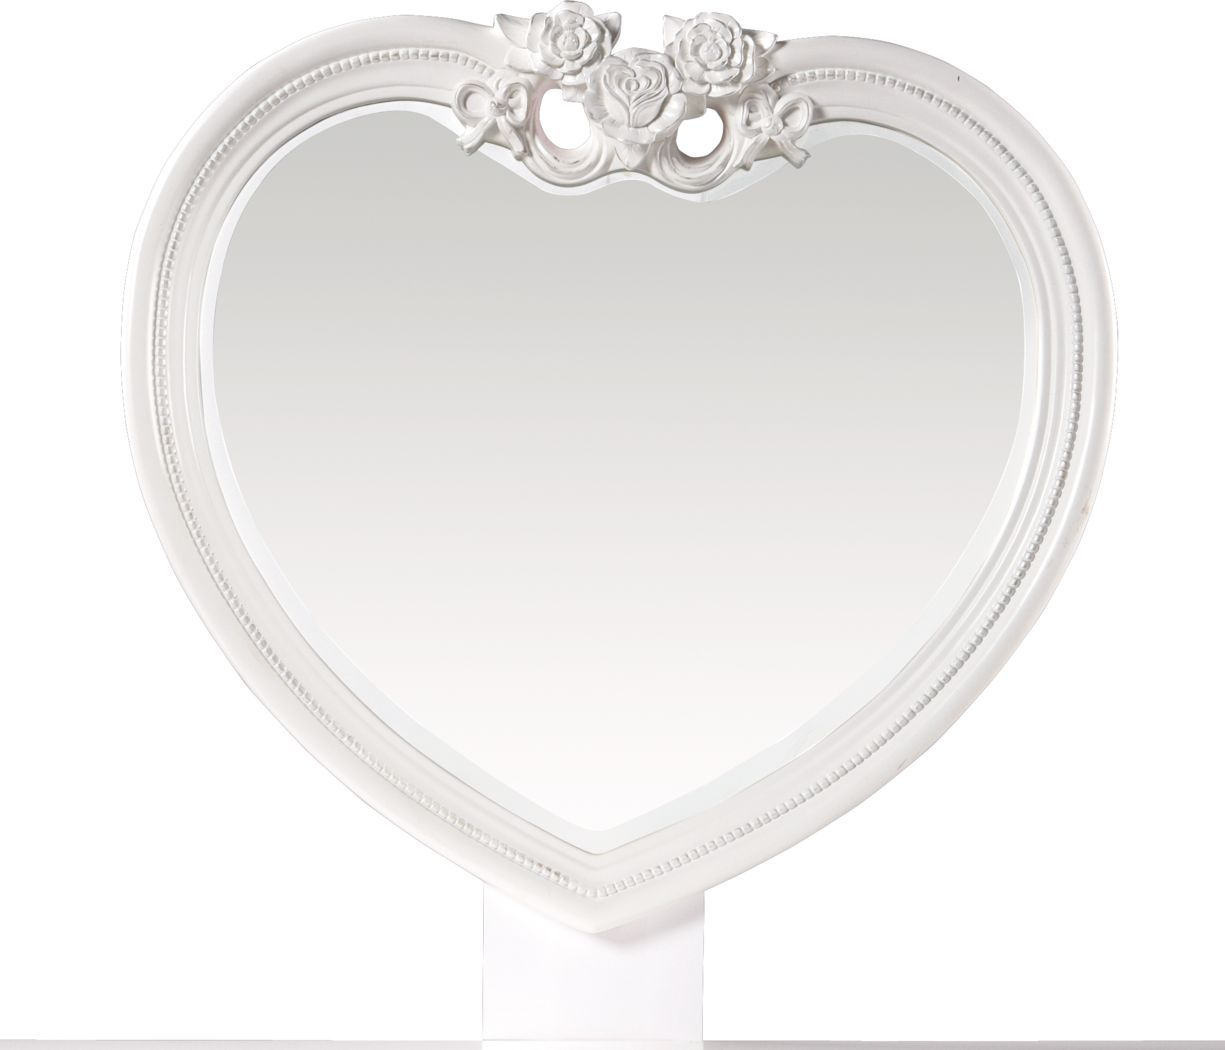 Disney Princess White Heart Mirror Heart Mirror Mirror White Heart